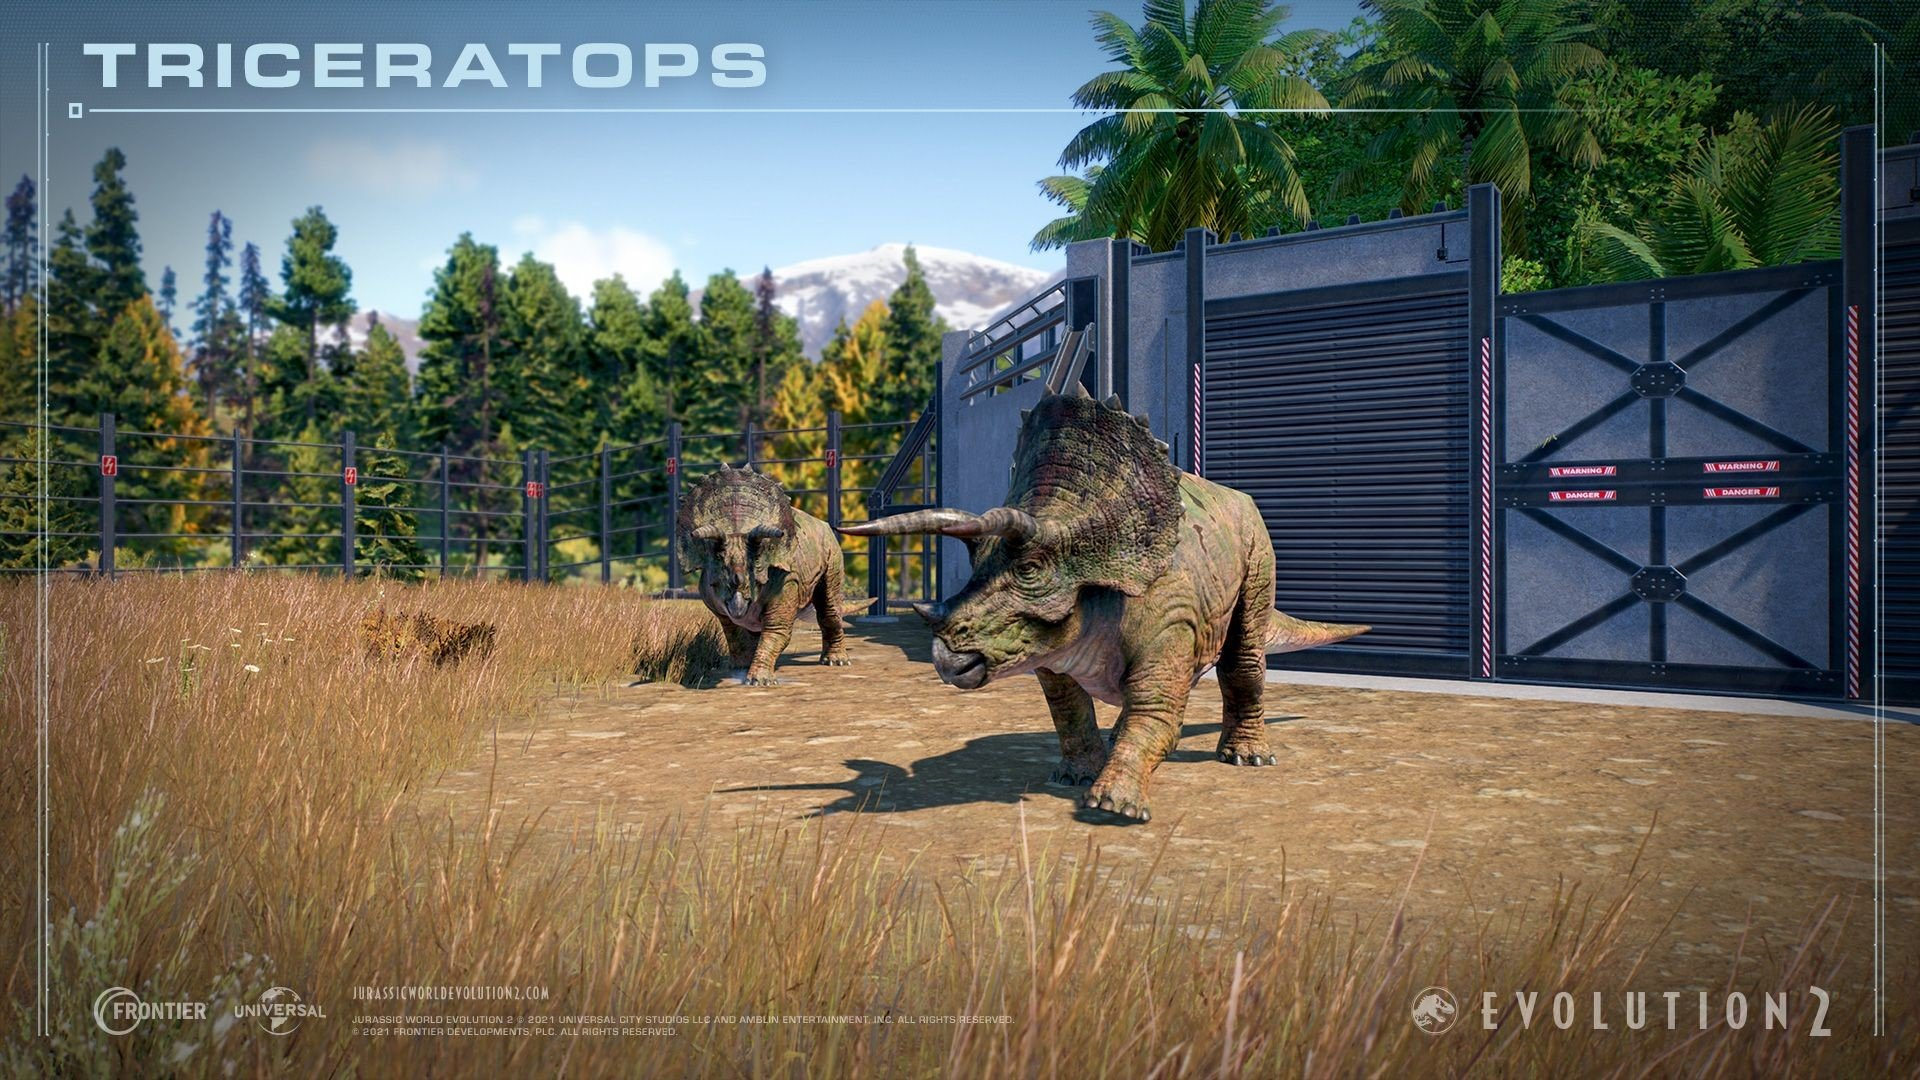 Jurassic-World-Evolution-2-Triceratops